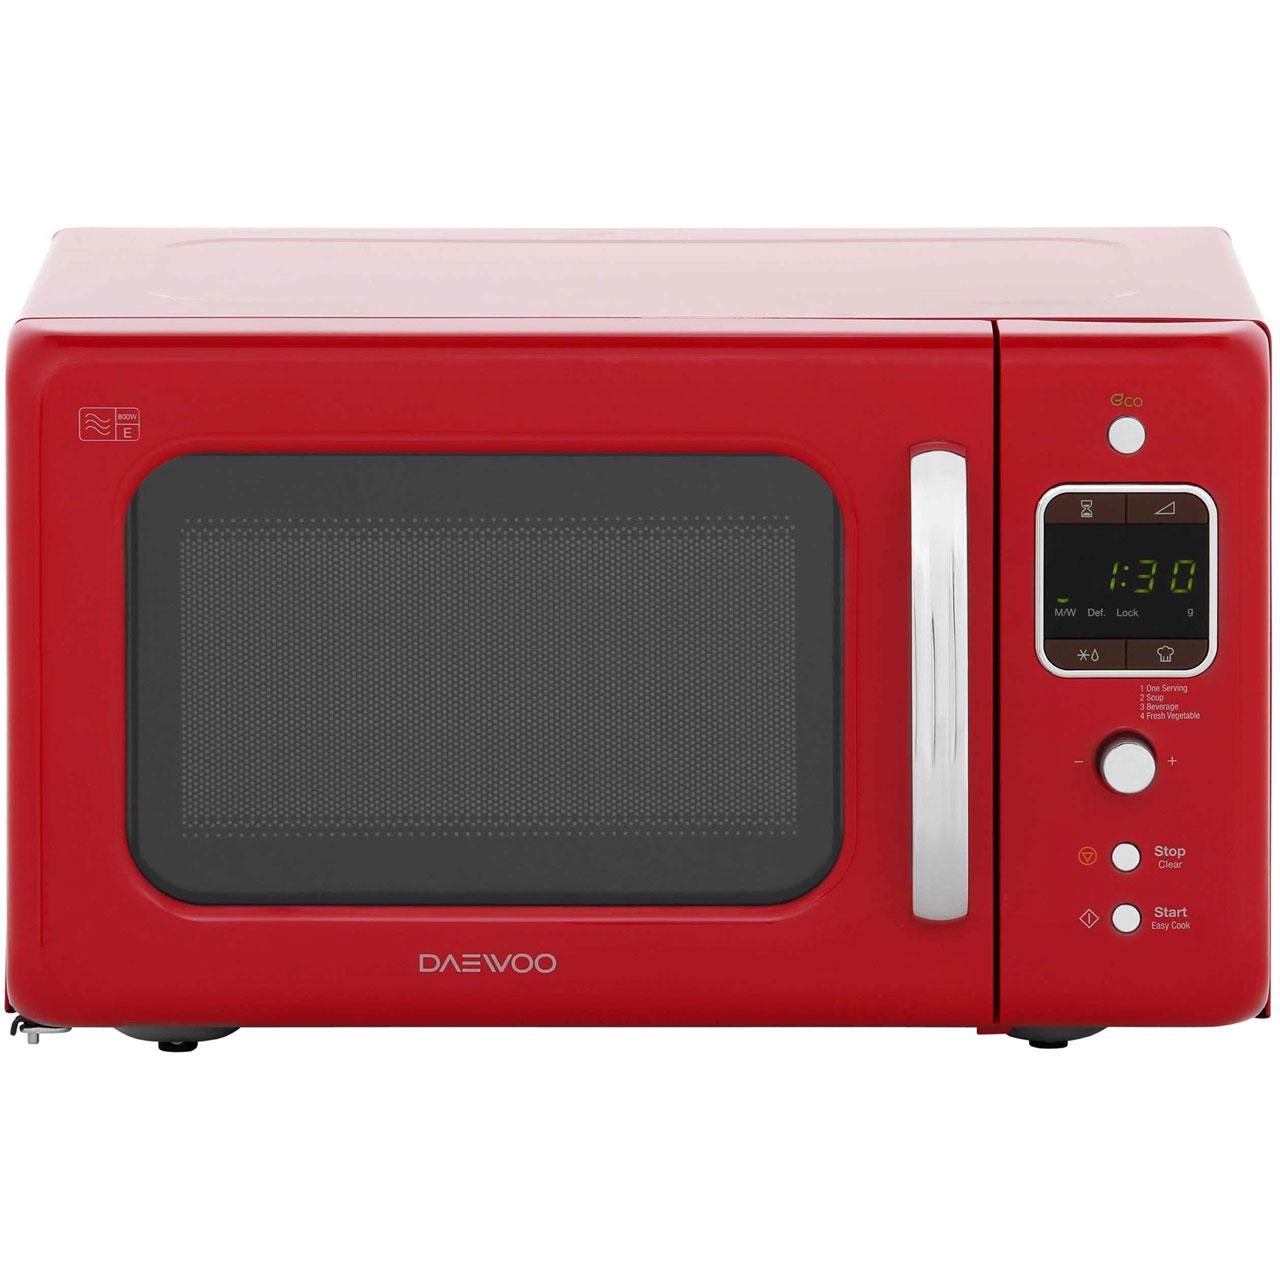 Uncategorized Kitchen Appliances Northampton kor7lbkr rd daewoo microwave red ao com